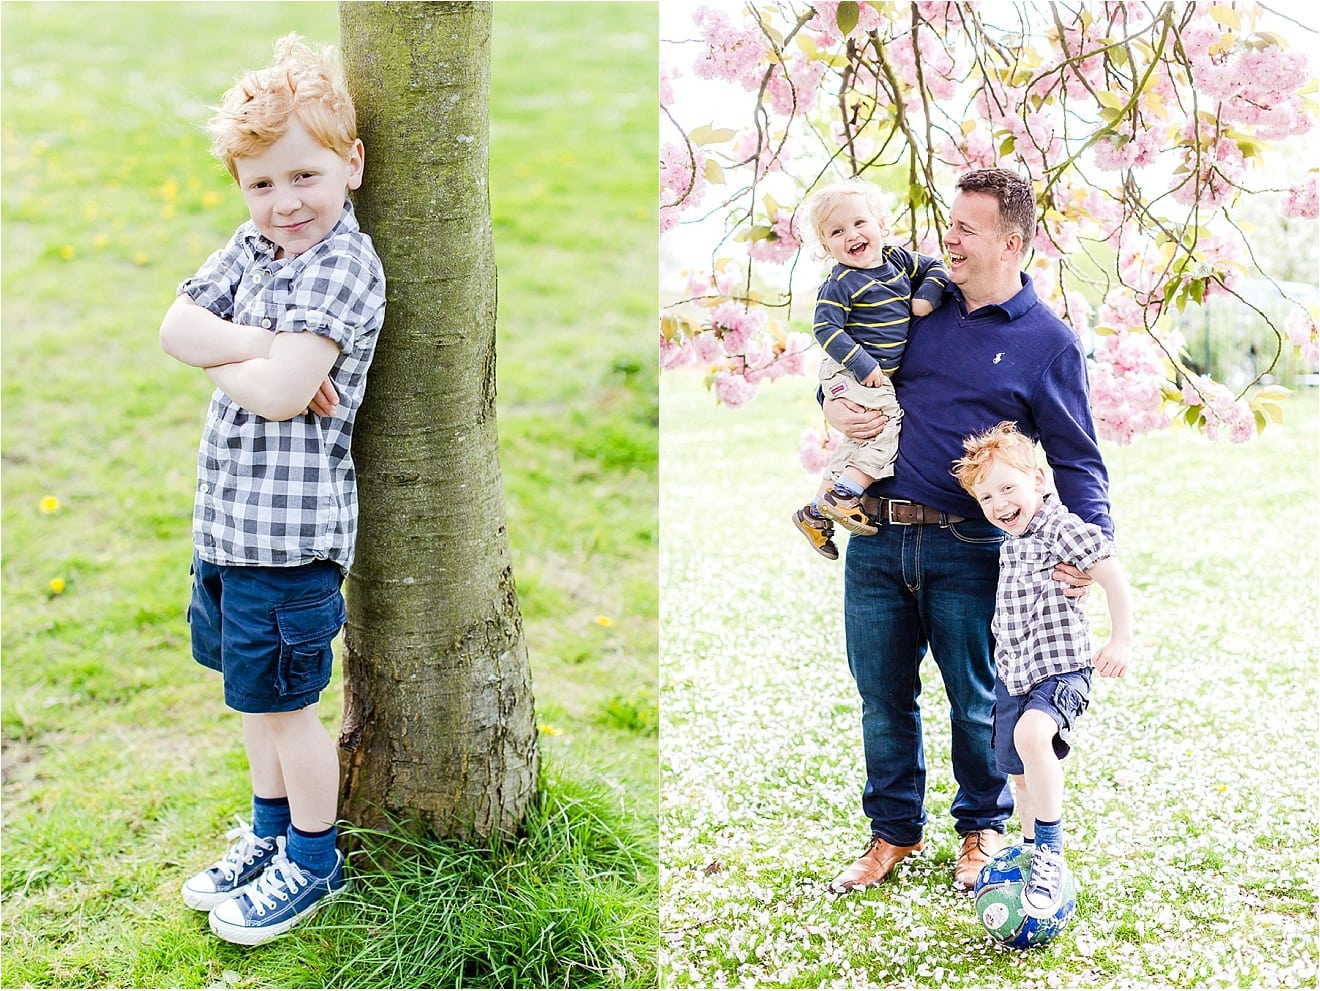 Eddie-Judd-Family-Portrait-Photography012